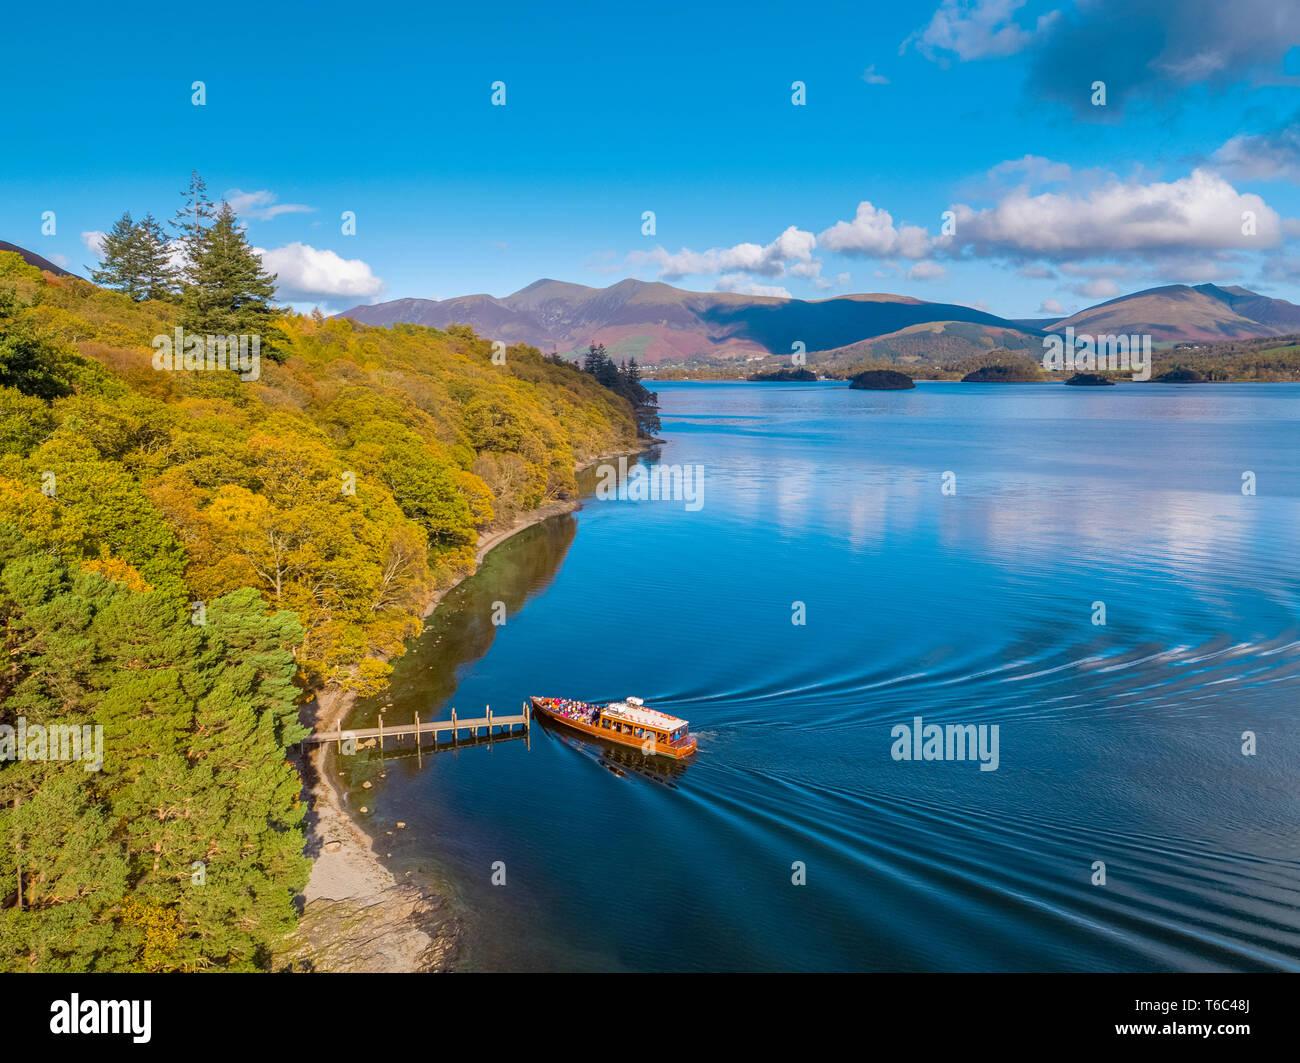 UK, Cumbria, Lake District, Keswick, Brandlehow Jetty et ferry Photo Stock